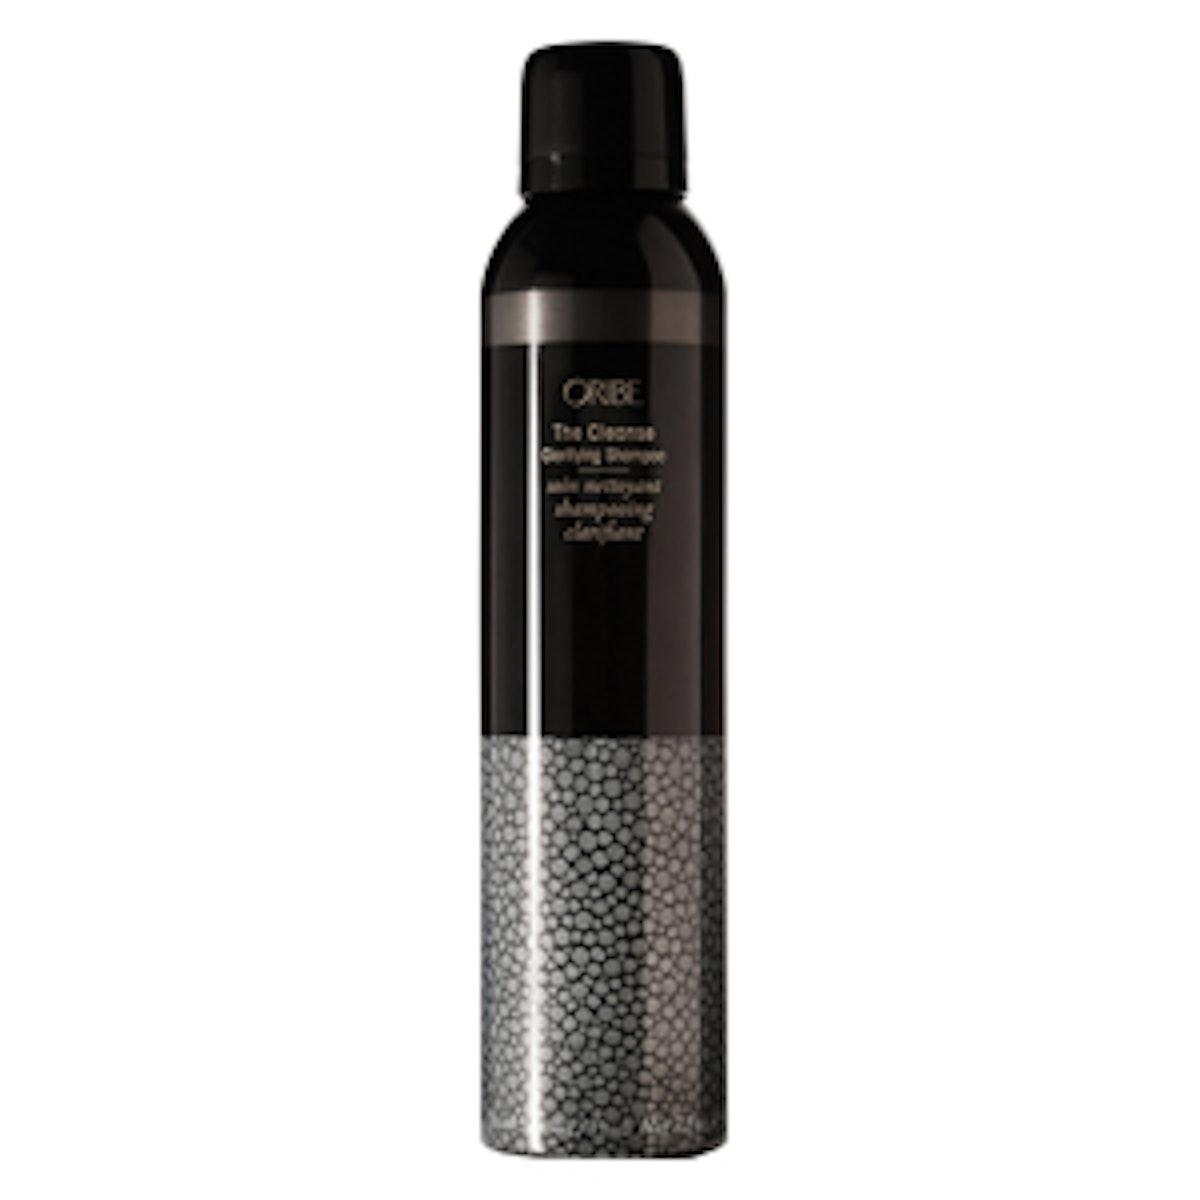 The Cleanse Clarifying Shampoo